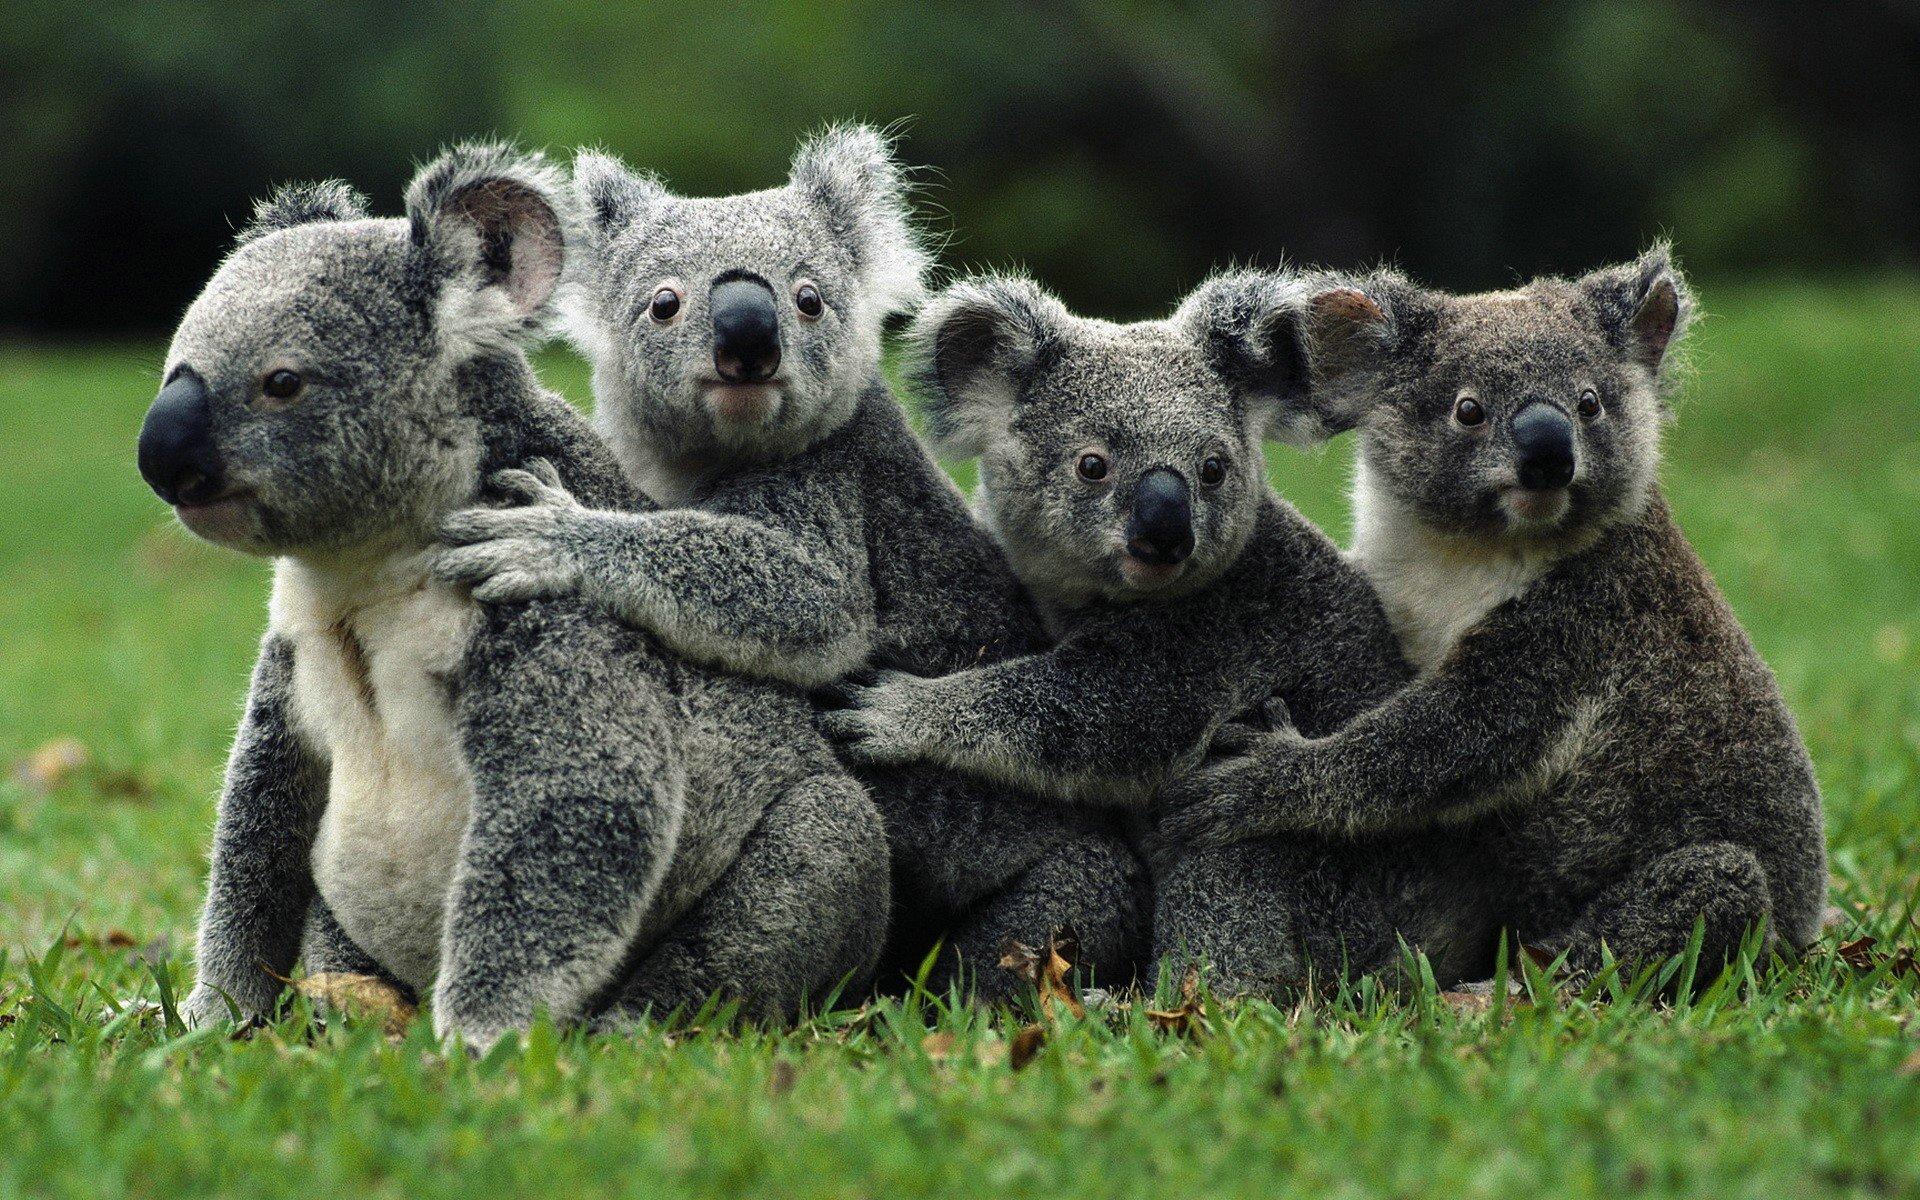 Koalas Vs Pandas | IGN Boards